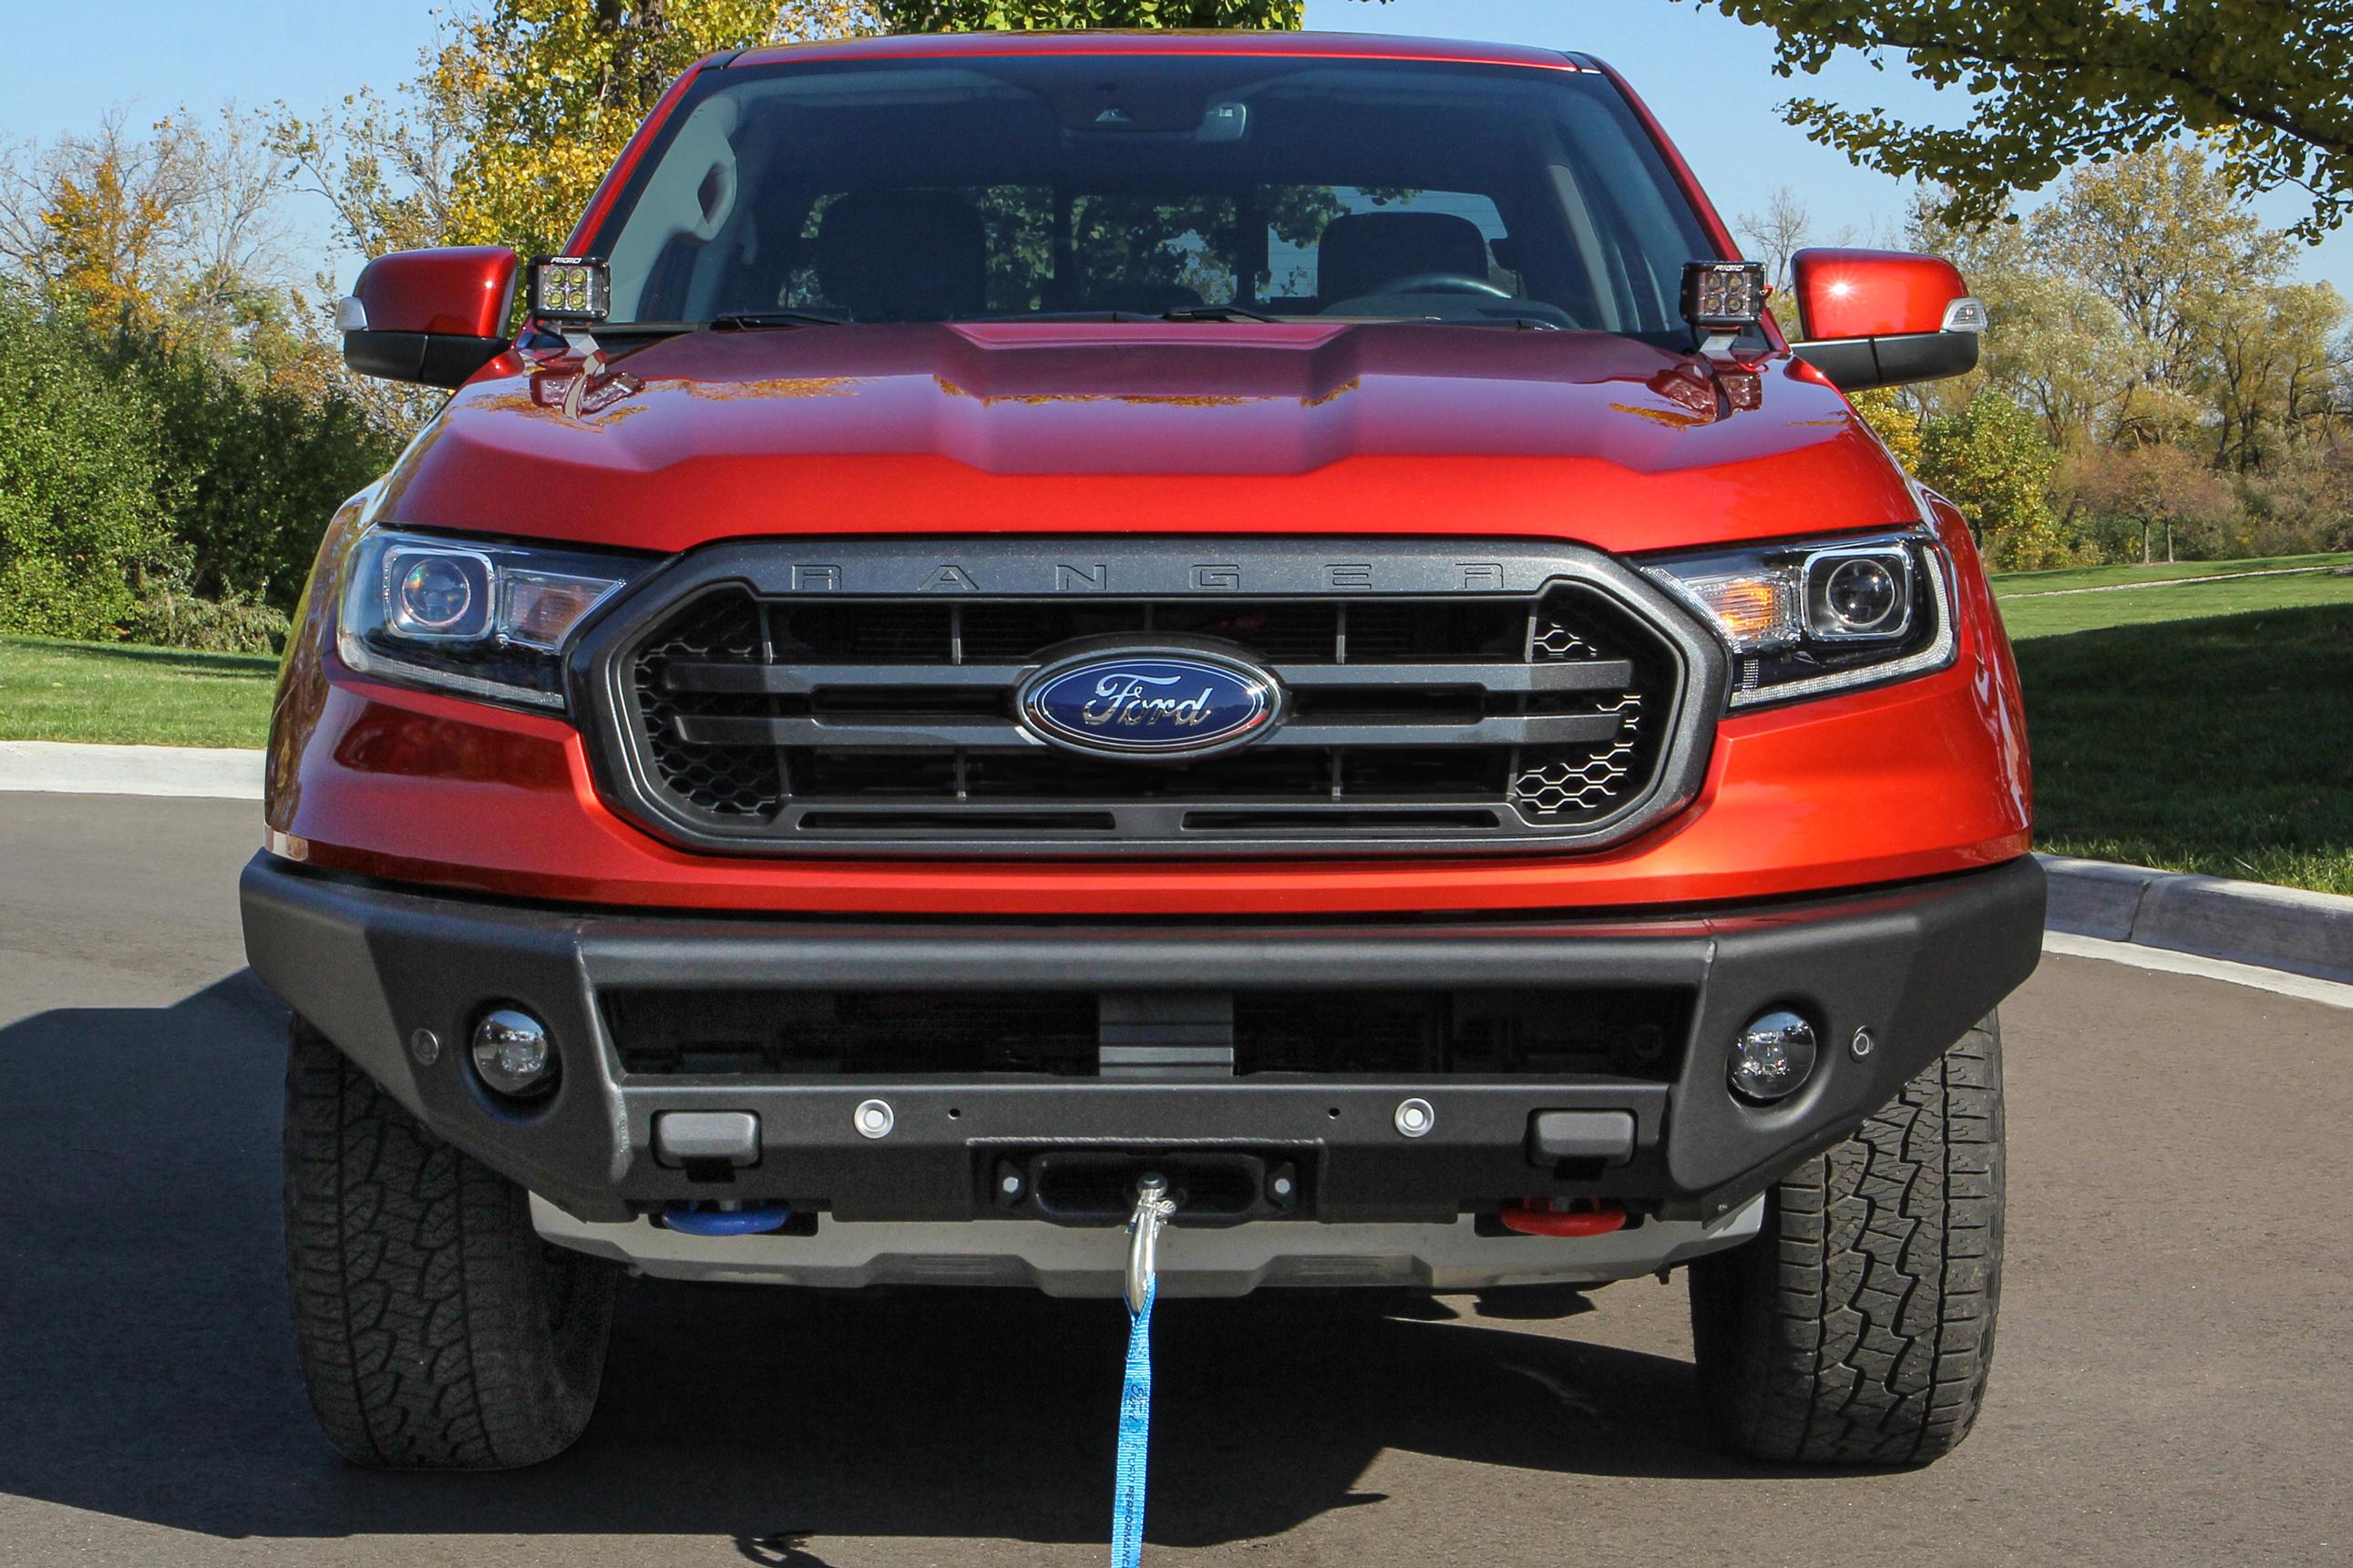 Ford Ranger ARB 4x4 winch bumper